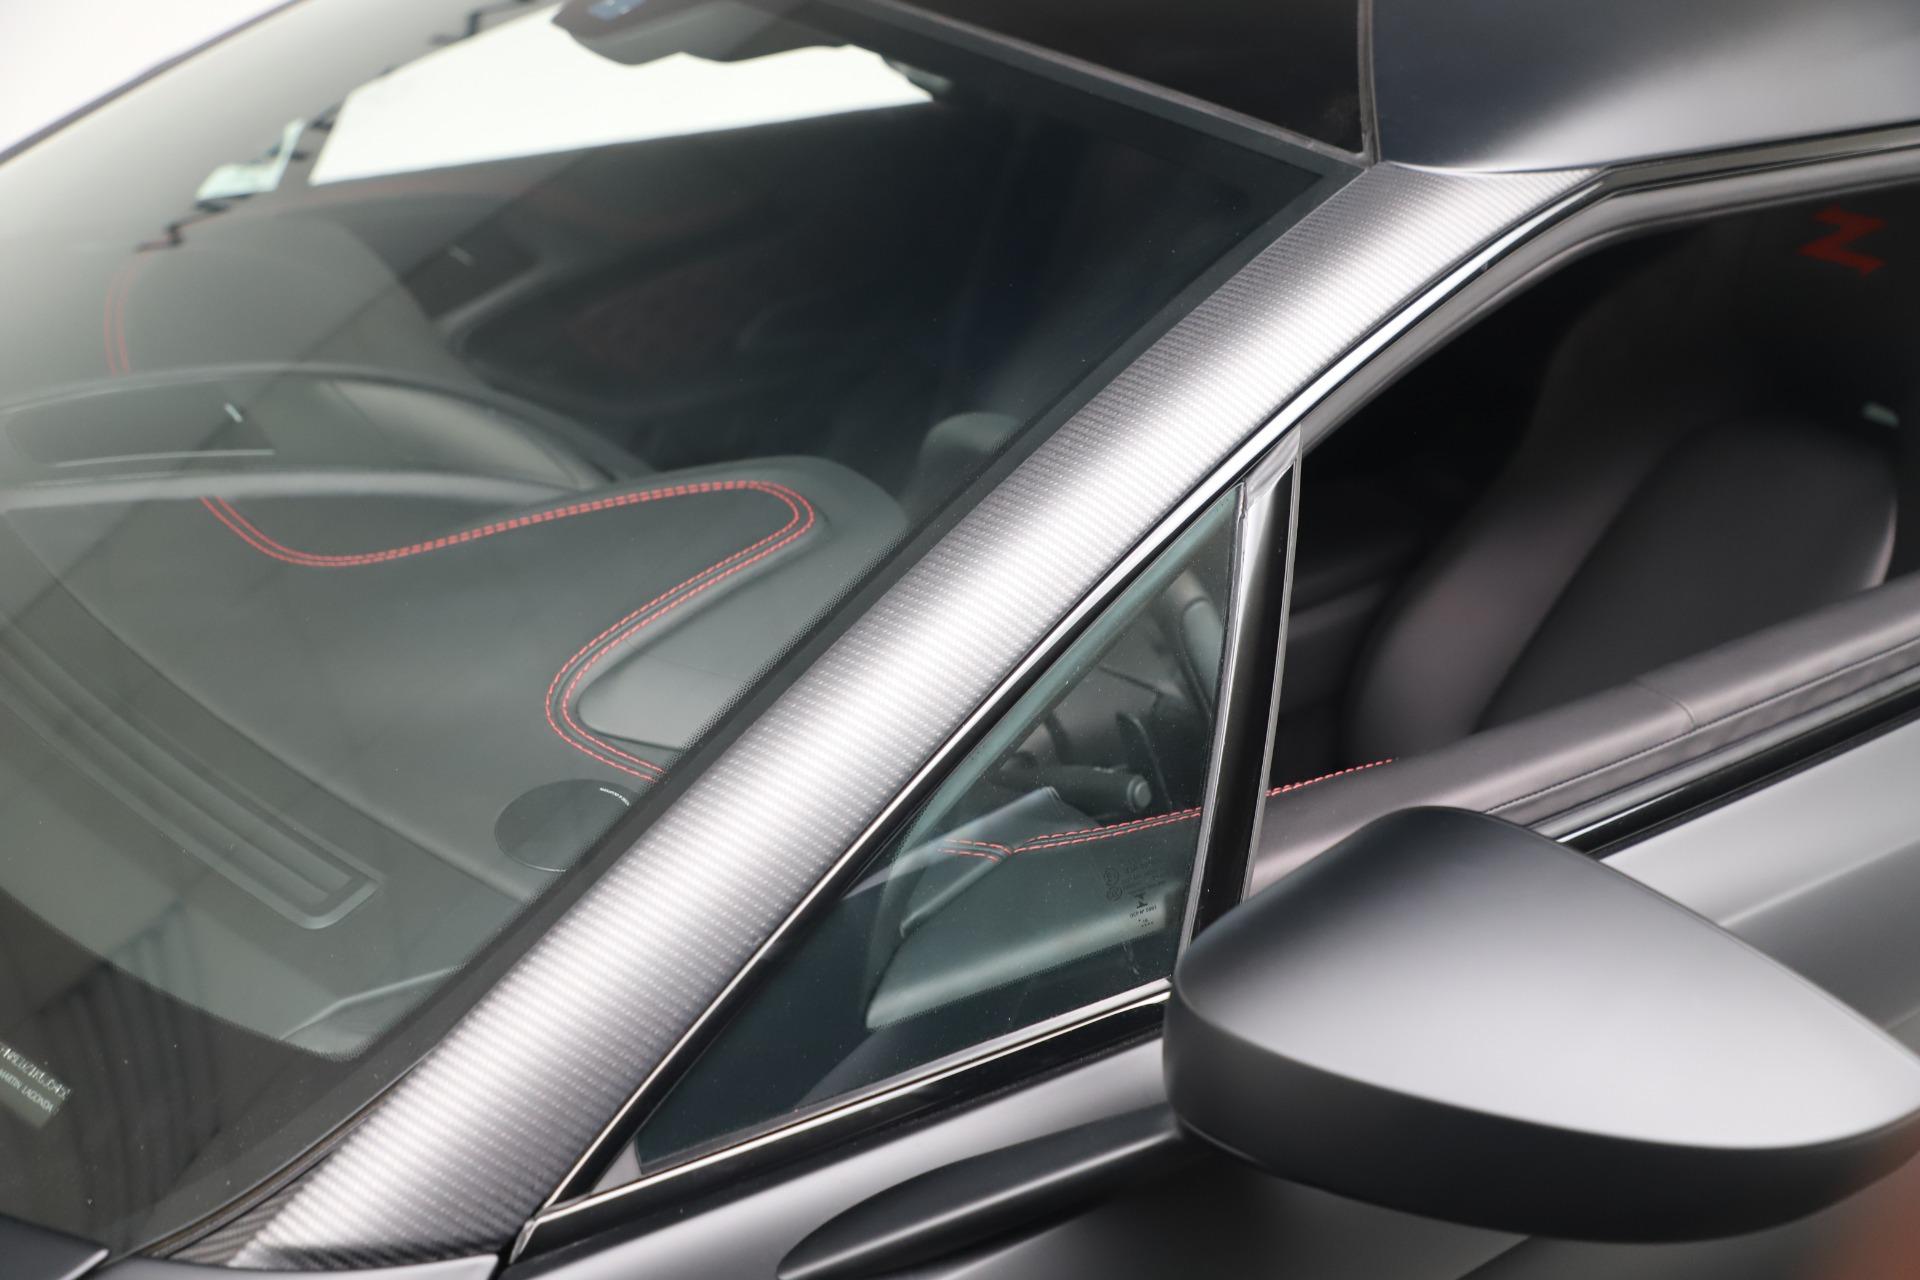 New 2019 Aston Martin Vanquish Shooting Brake For Sale In Westport, CT 3512_p26